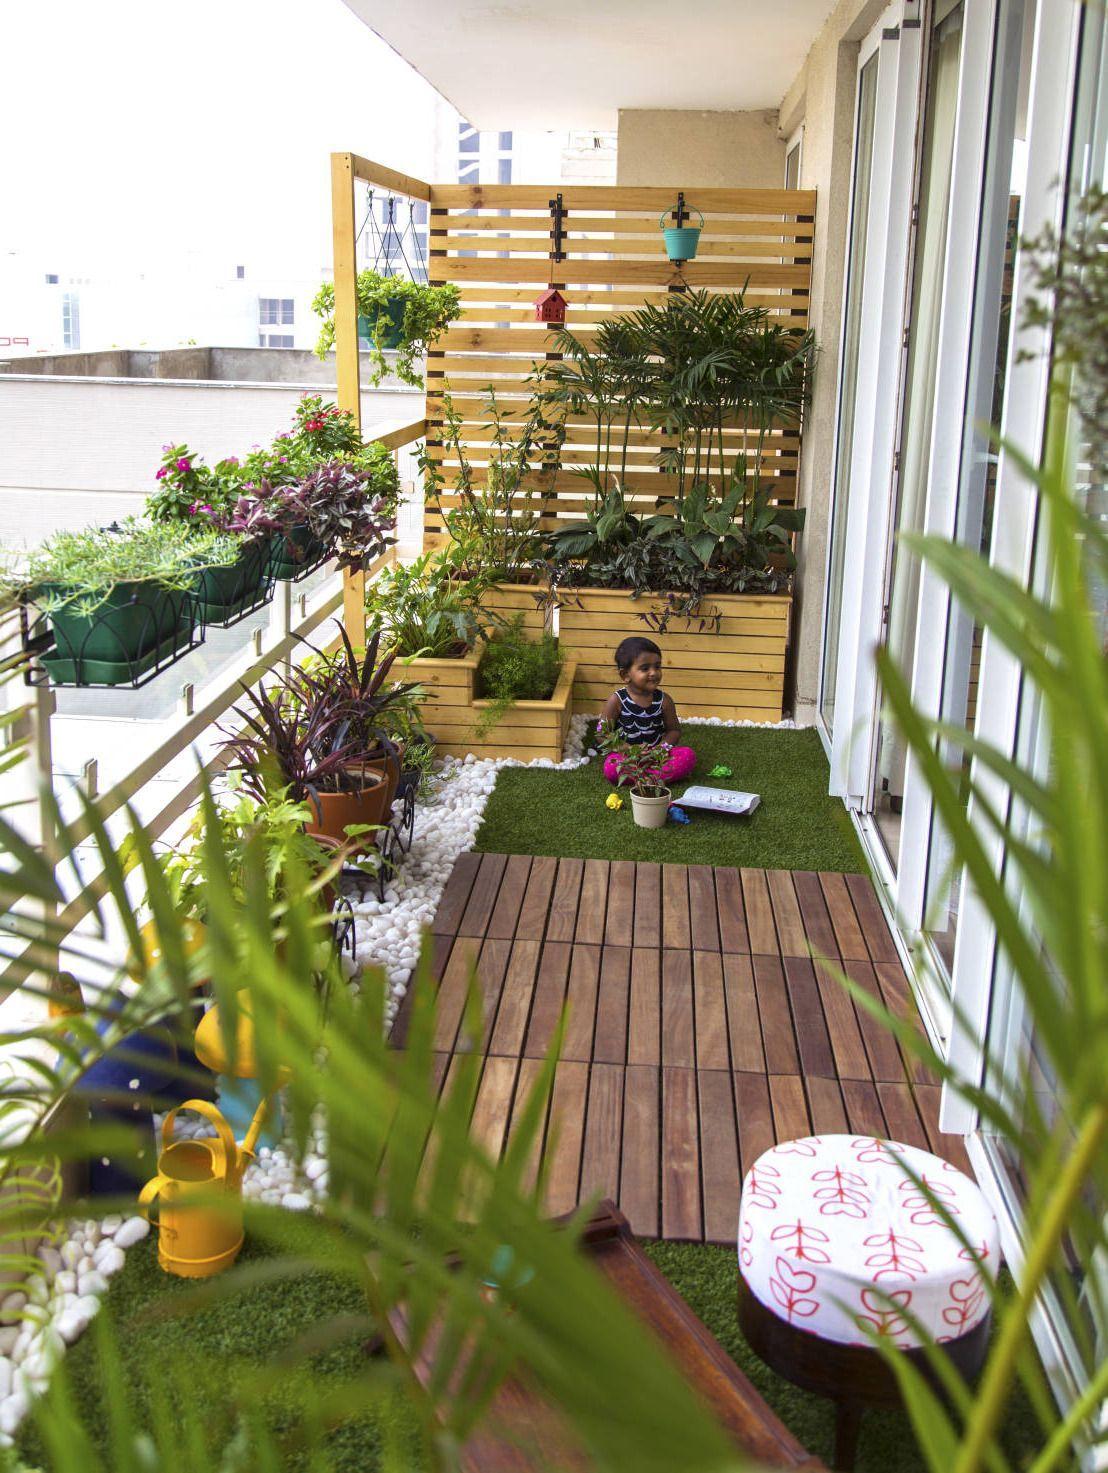 Very Small Garden Ideas India Check More At Www Arch20 Club These Yard Style And Design Ide In 2020 Terrace Garden Design Small Balcony Garden Luxury Garden